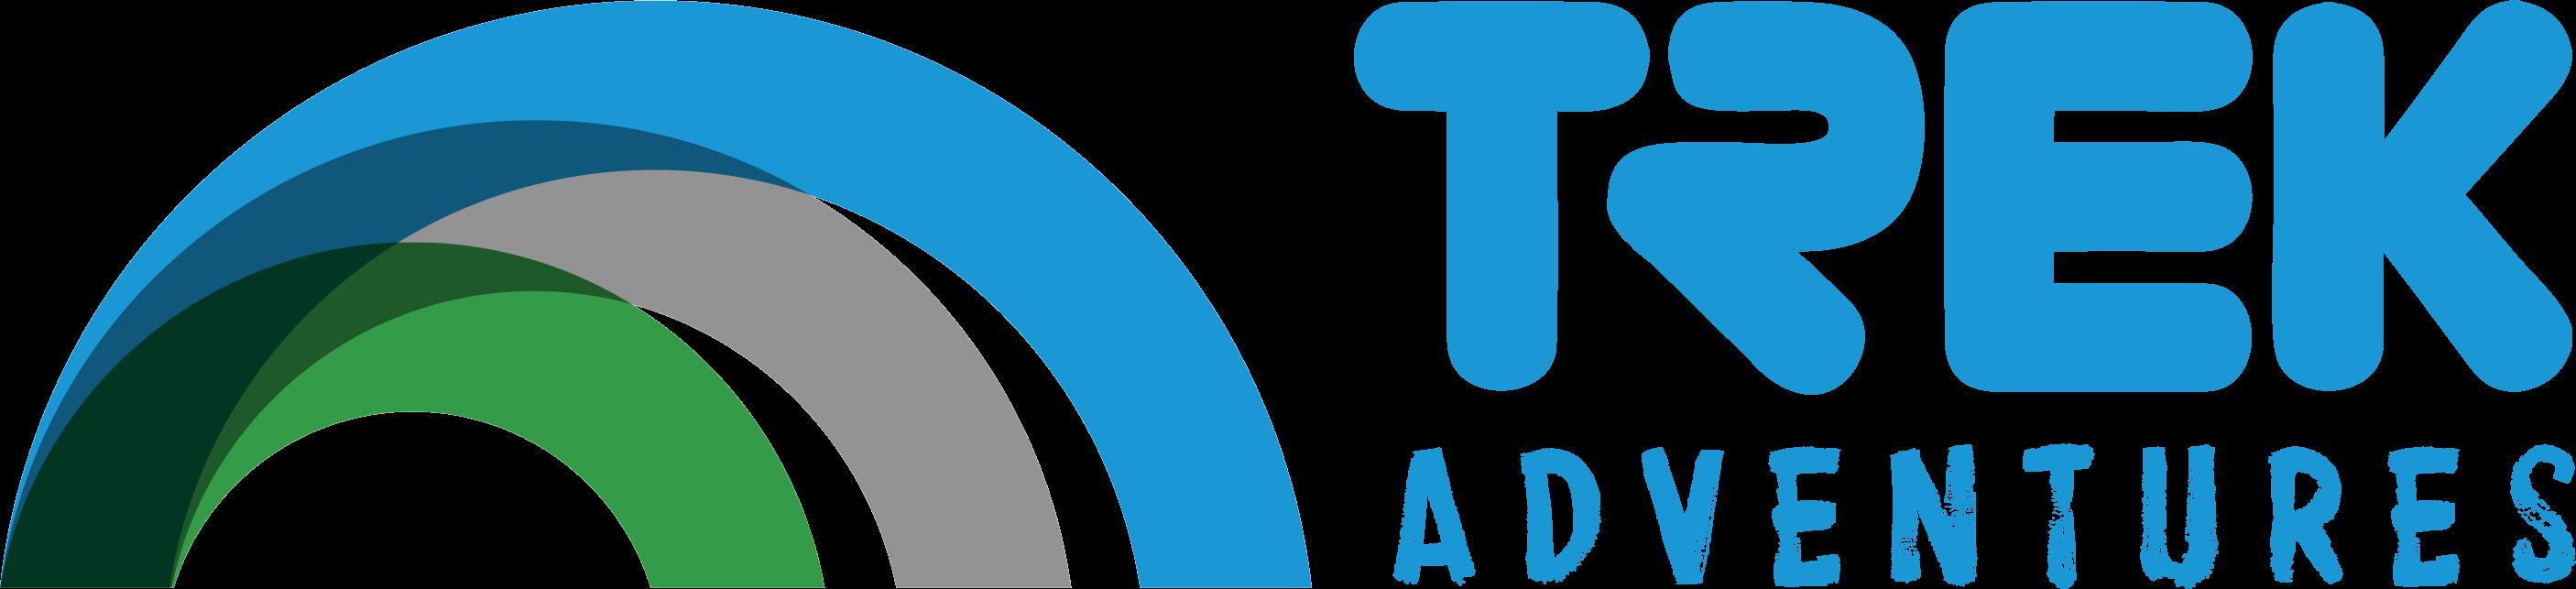 Read Trek-Adventures (formally Sea-Trek Adventures) Reviews